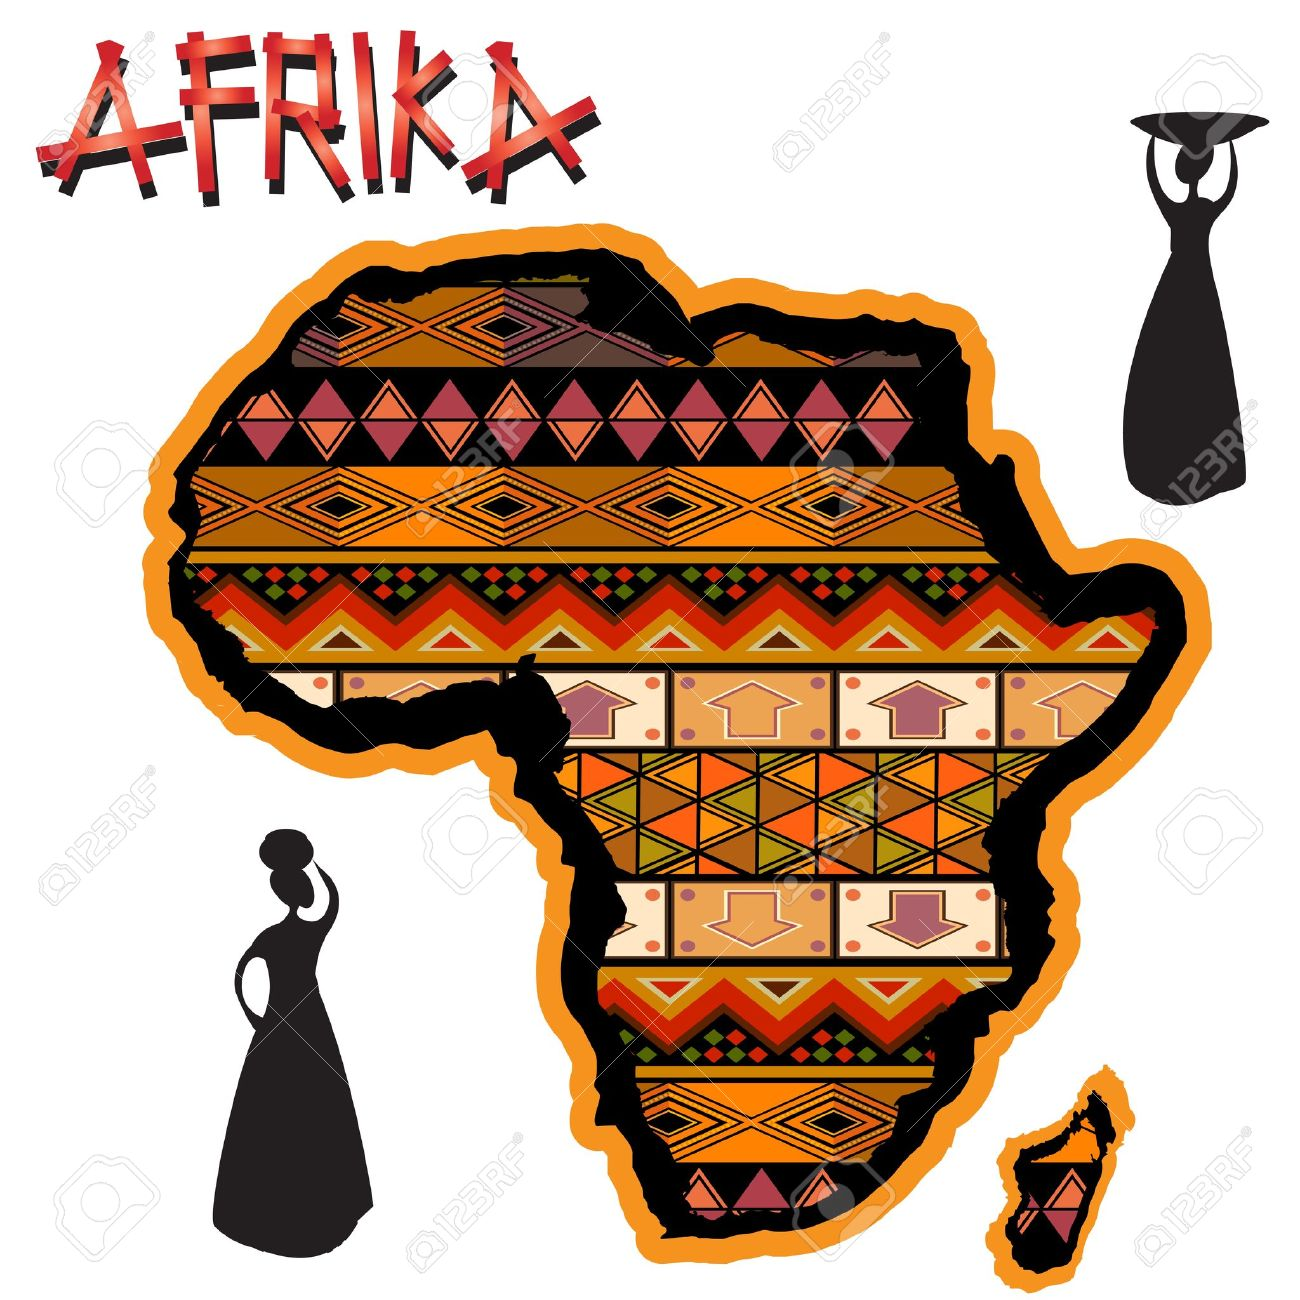 Africa on emaze.